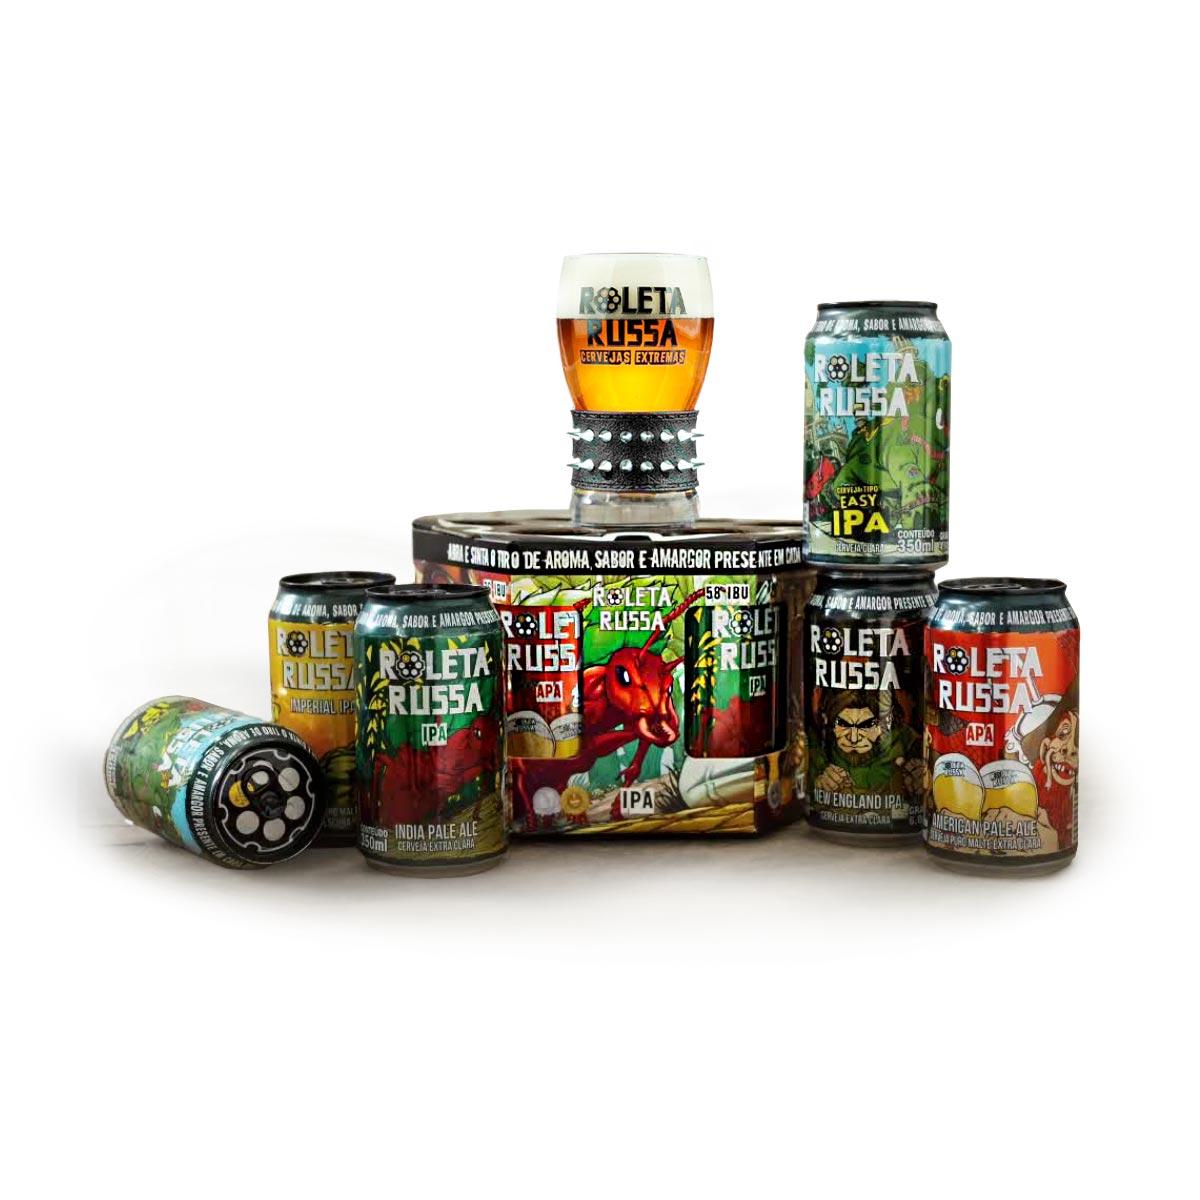 Kit Roleta Russa 6 cervejas lata 350 ml + copo 320 ml com pulseira